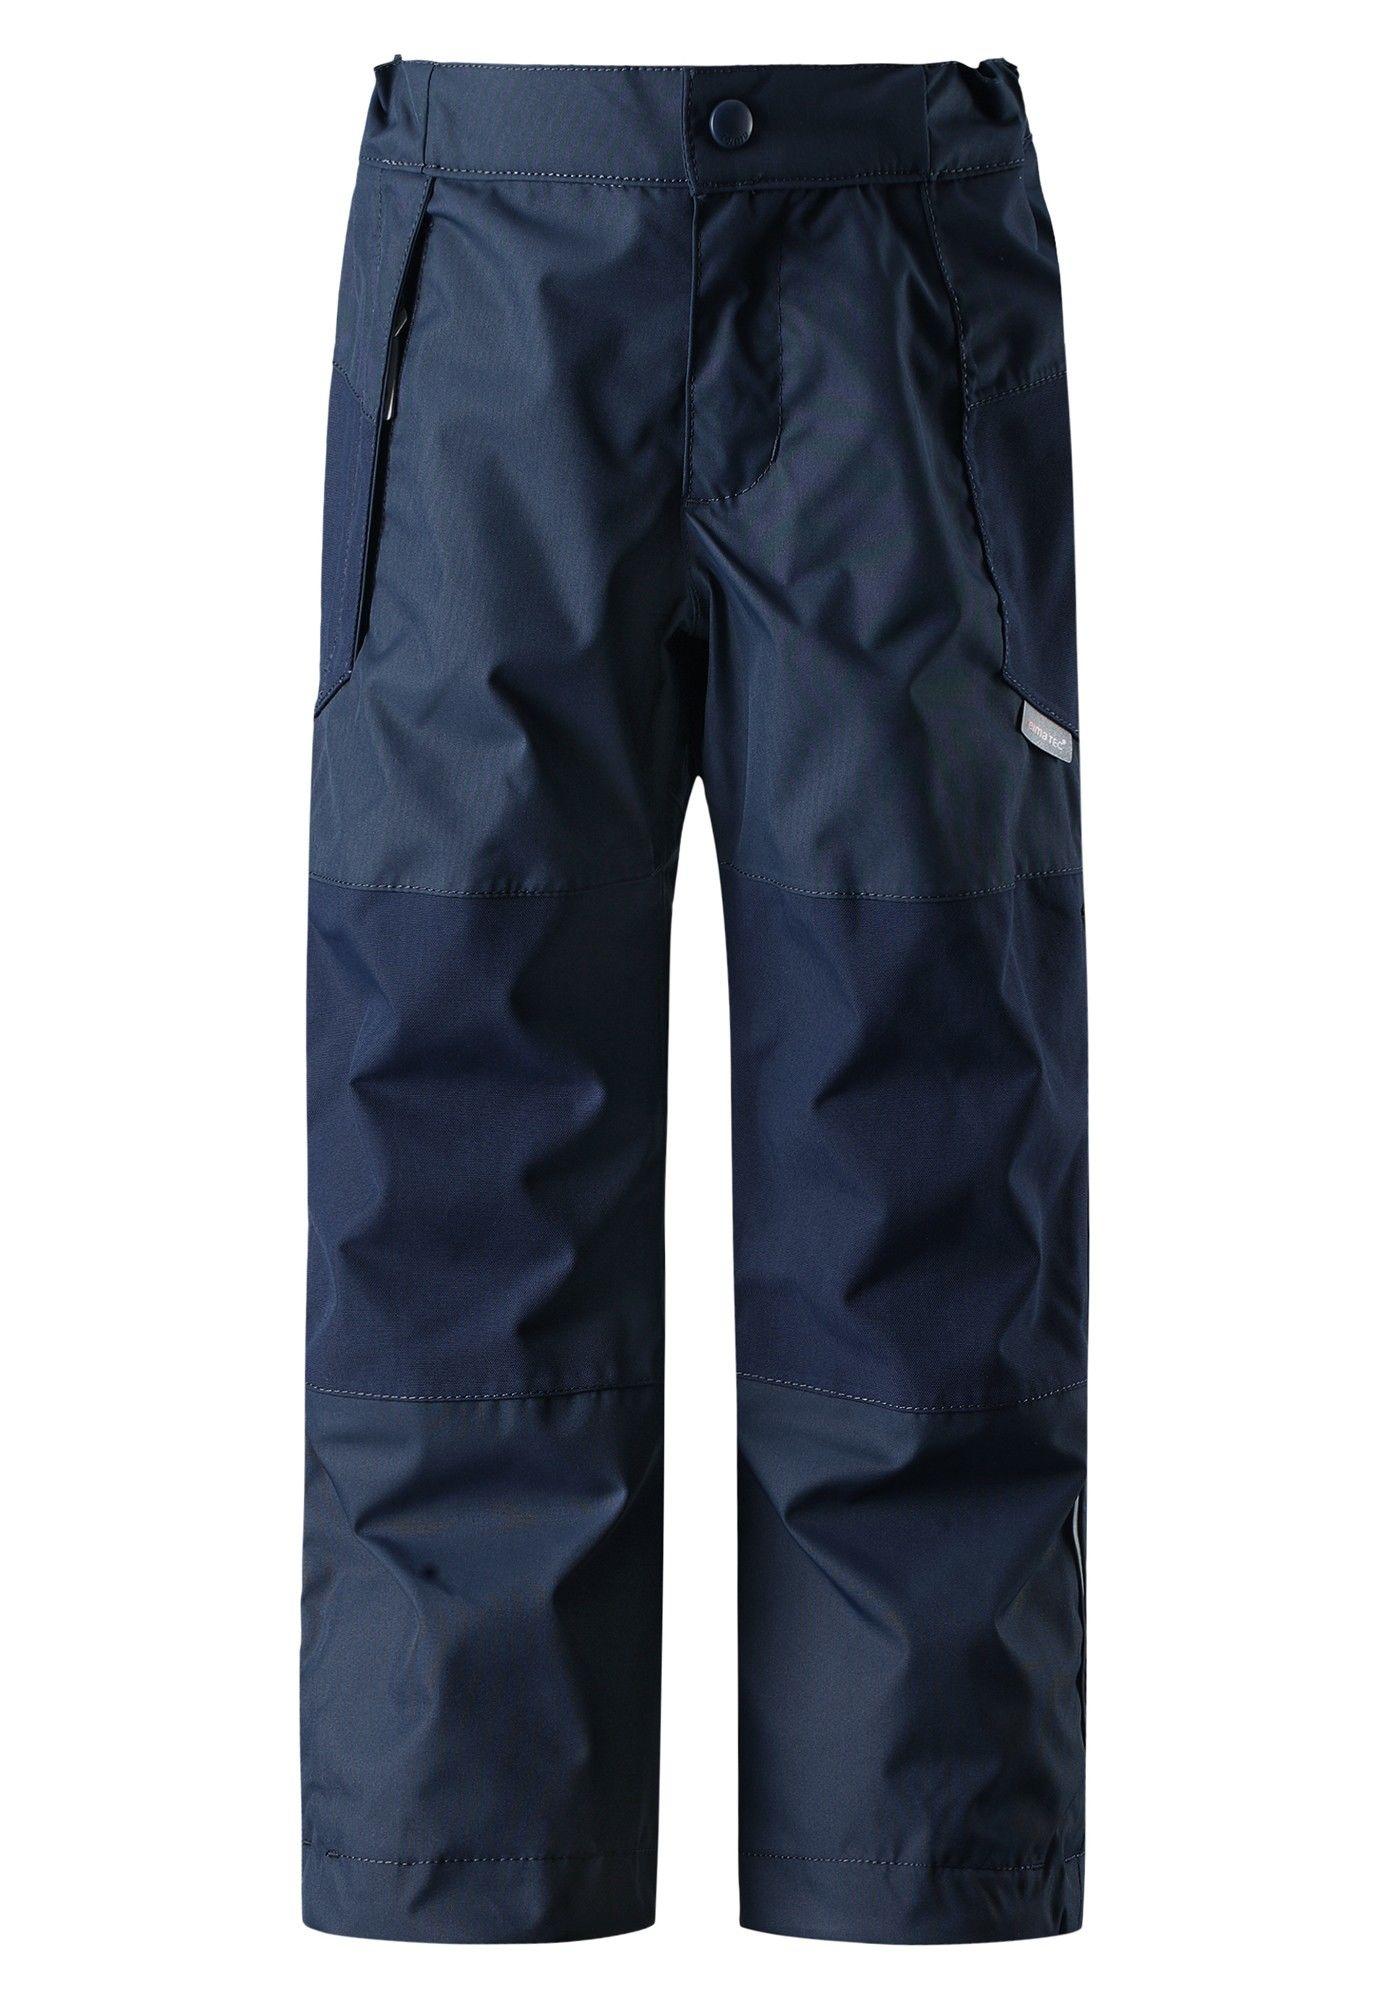 Reima Kids Lento Pants Blau, 140 -Farbe Navy, 140